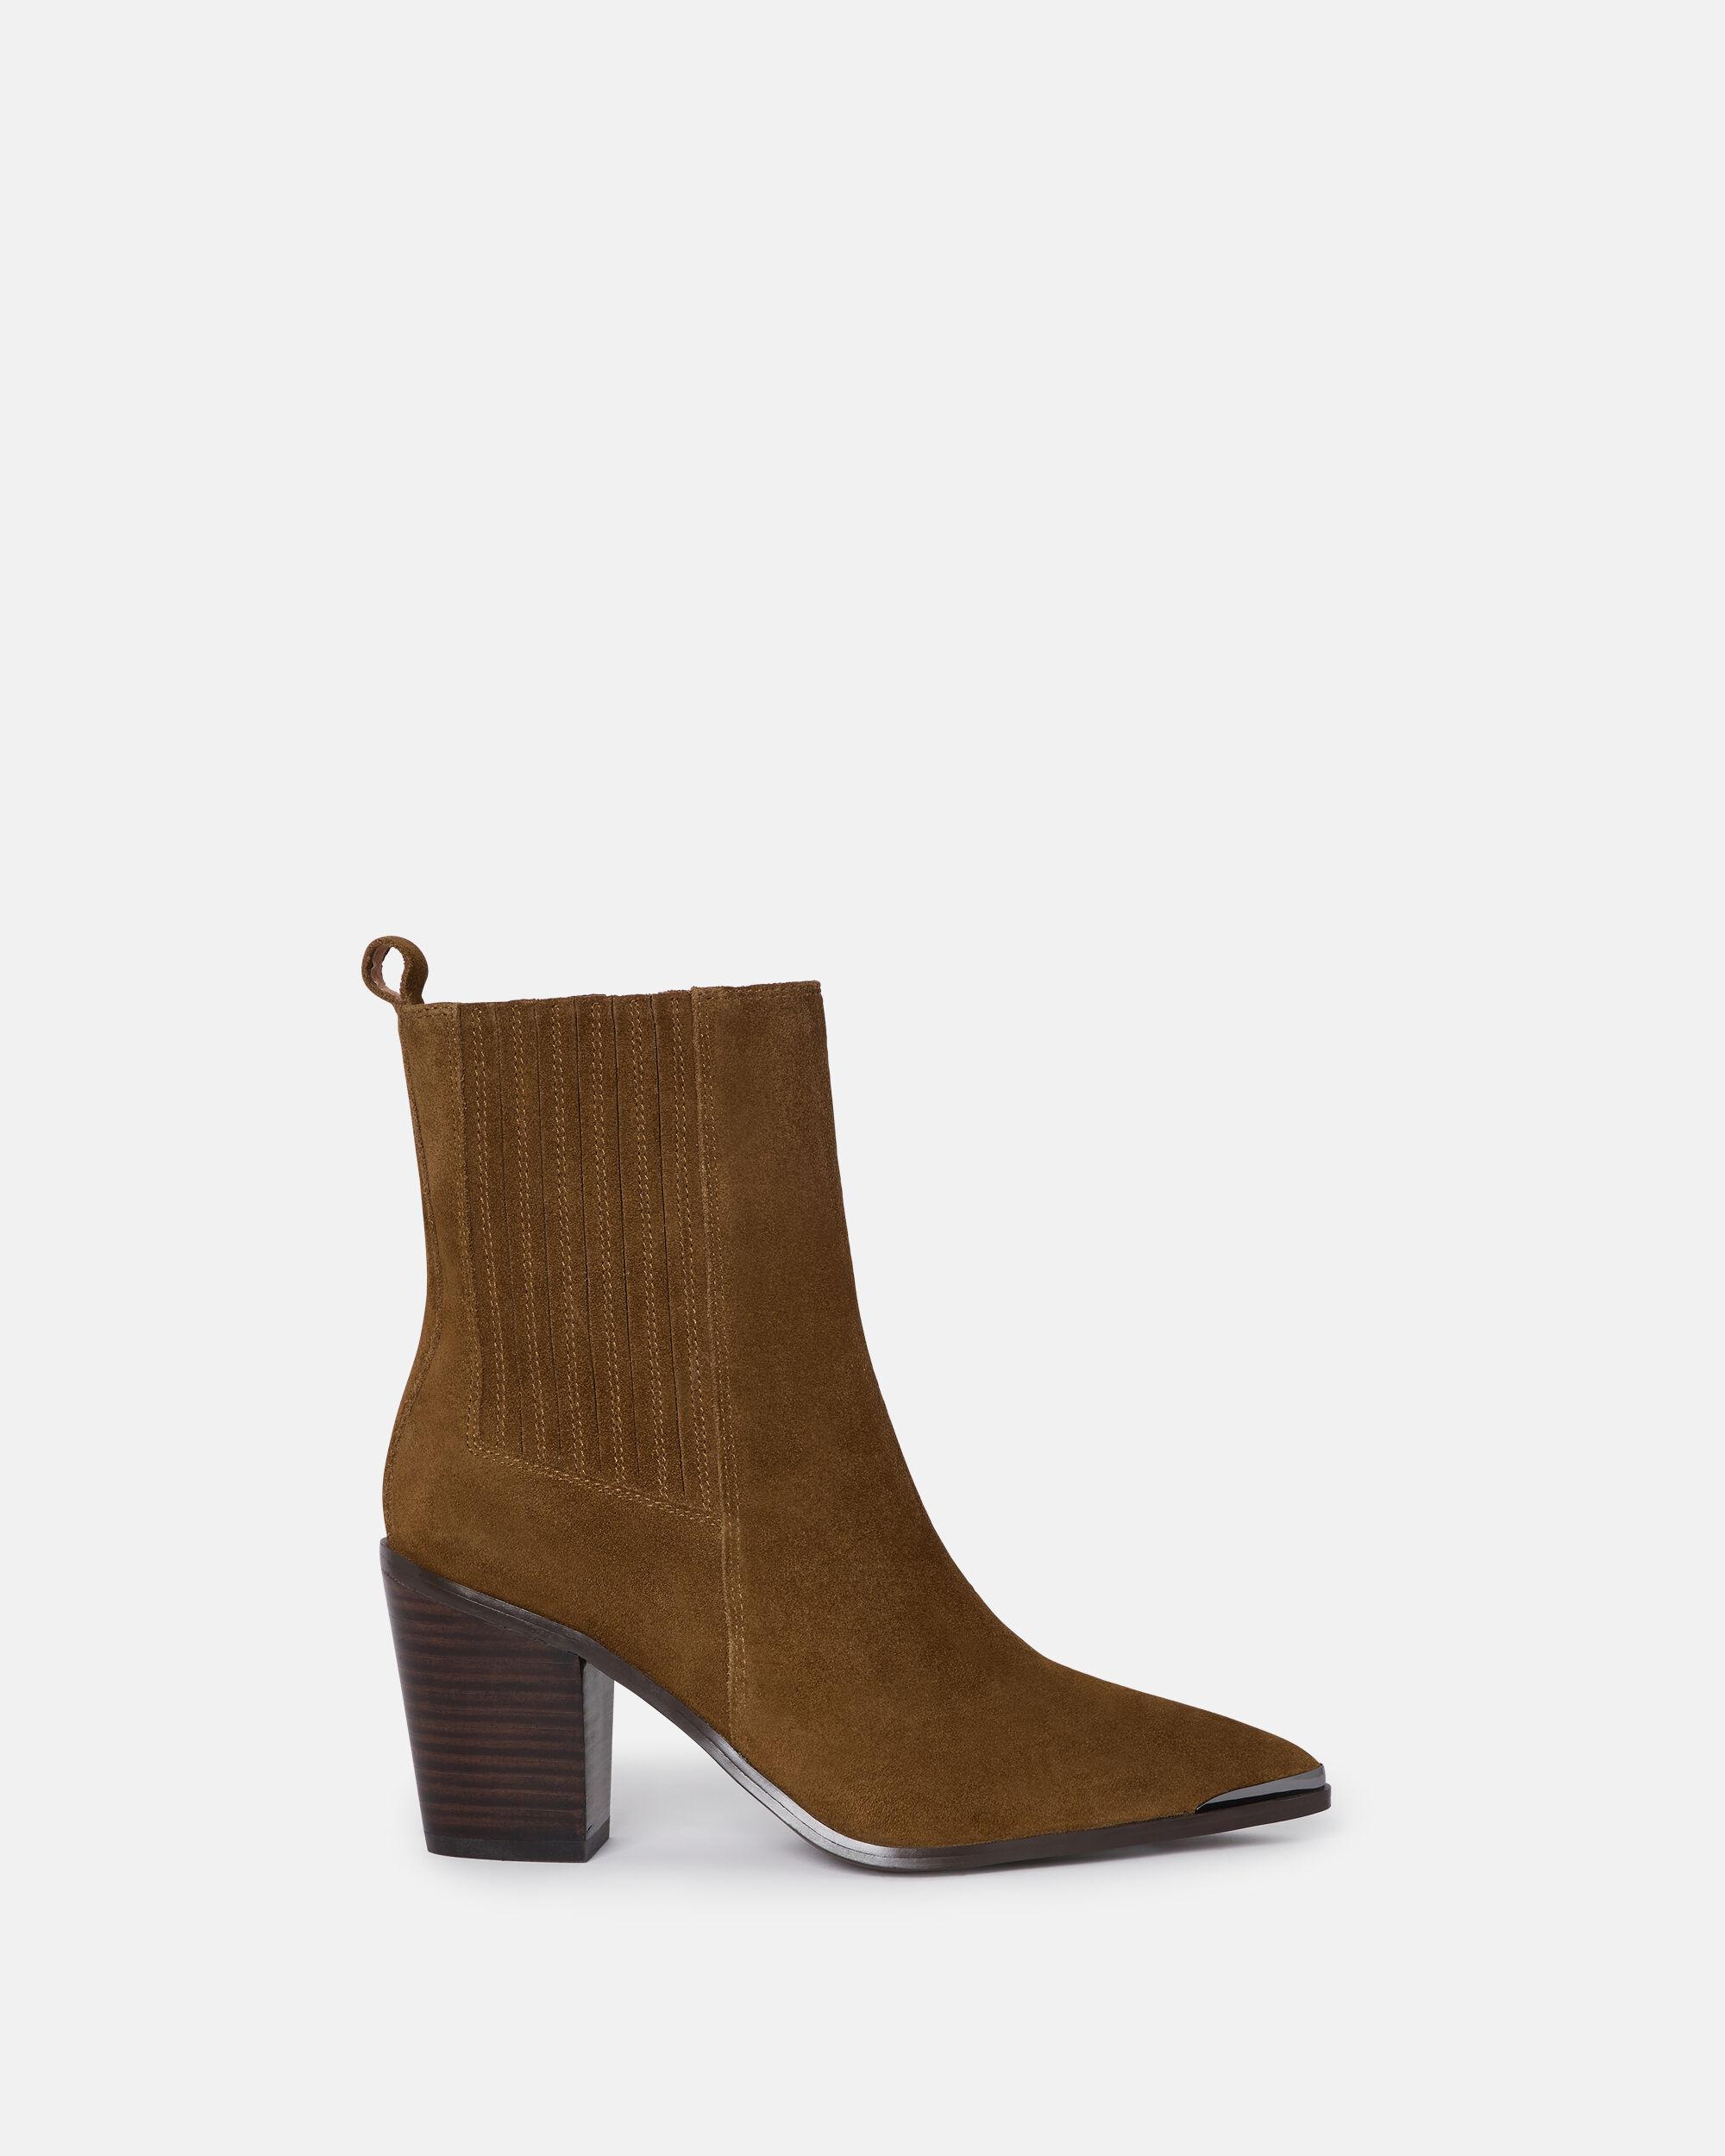 Boots Femme \u2013 Bottines, Boots femme cuir \u2013 boots Chelsea Minelli